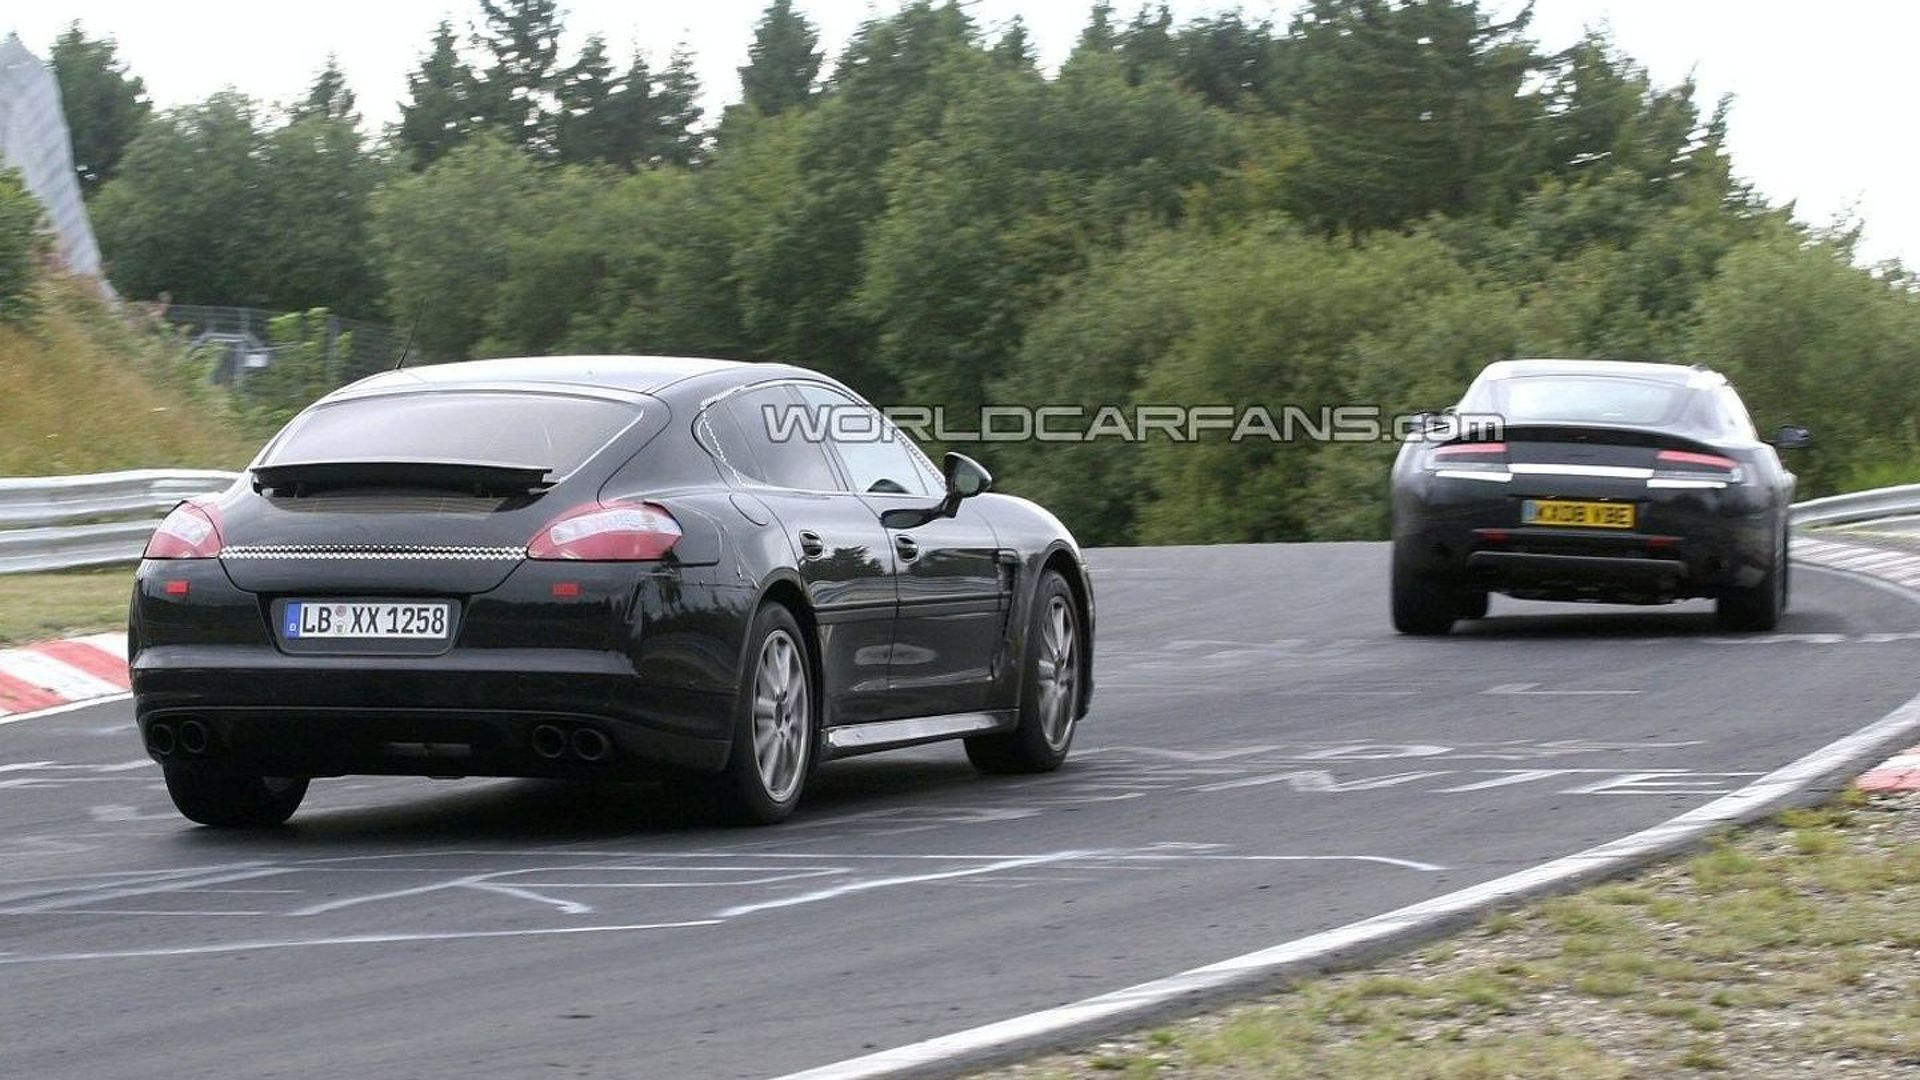 Aston Martin Rapide Vs Porsche Panamera 46314